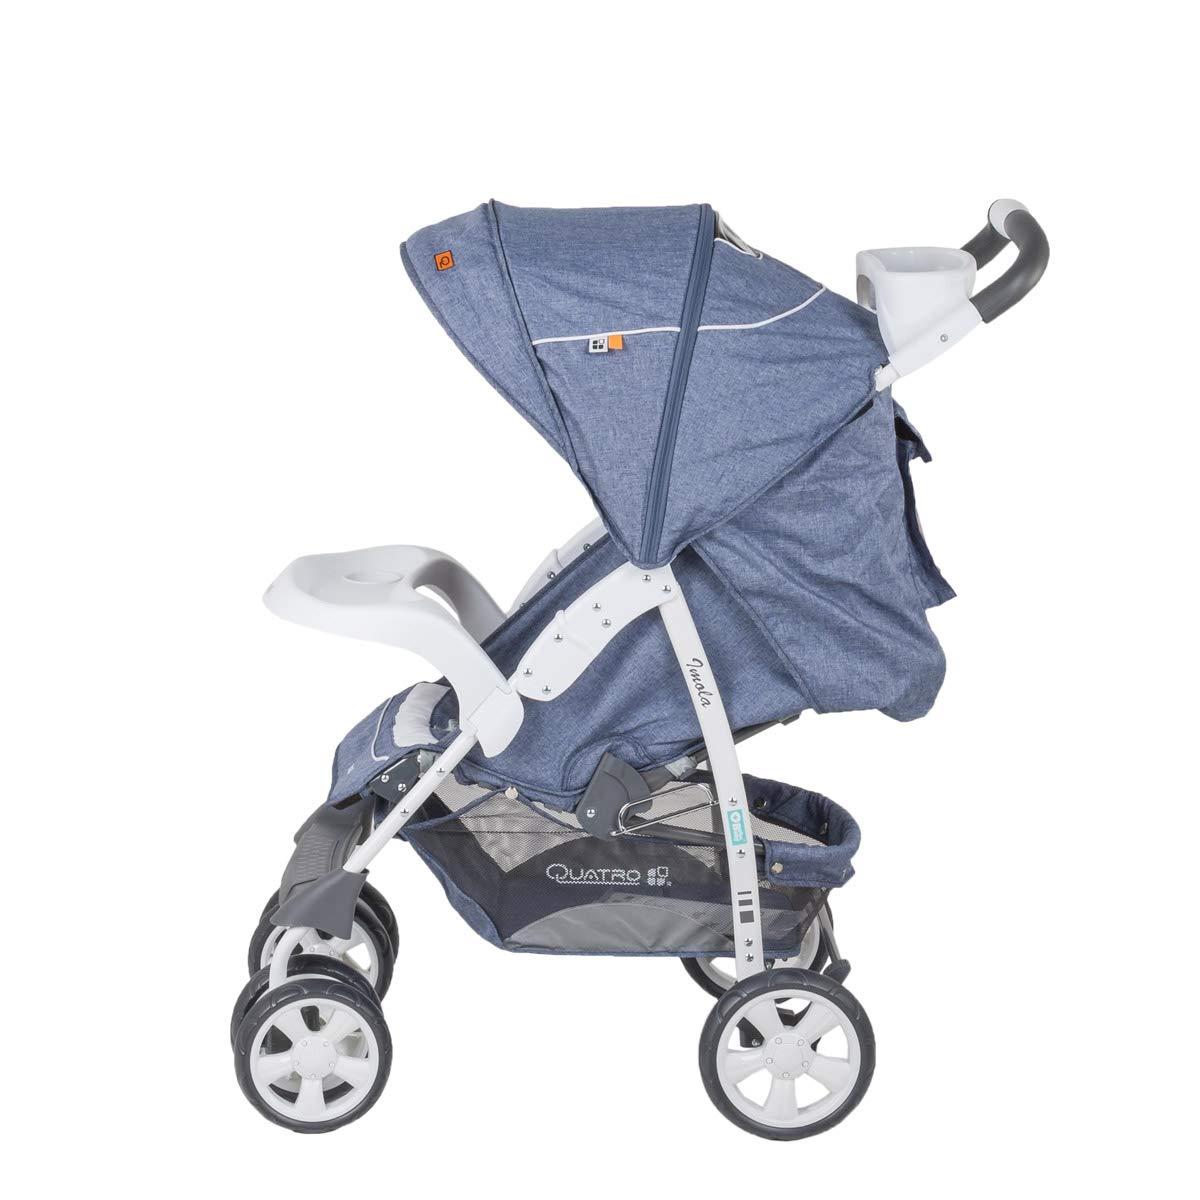 BeBe-Mobile Kinderwagen Buggy Jogger Sportwagen Kinderbuggy Klappbar Quatro Imola 11 blau